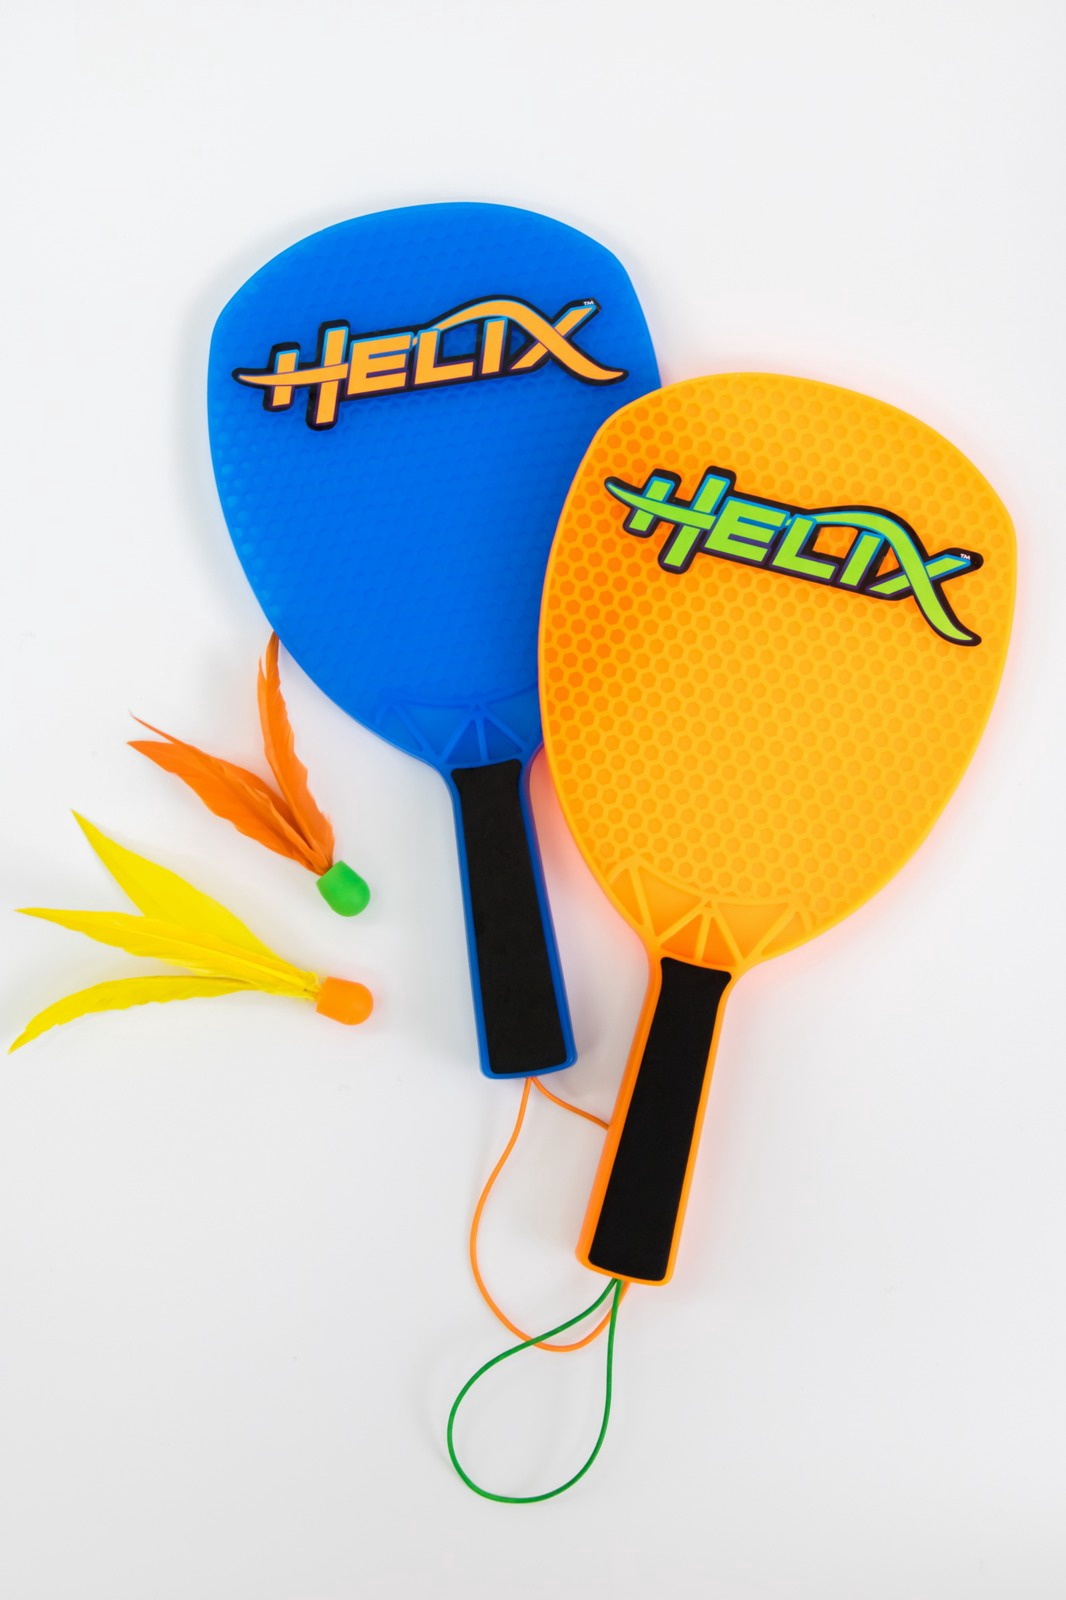 HELIX TENNIS